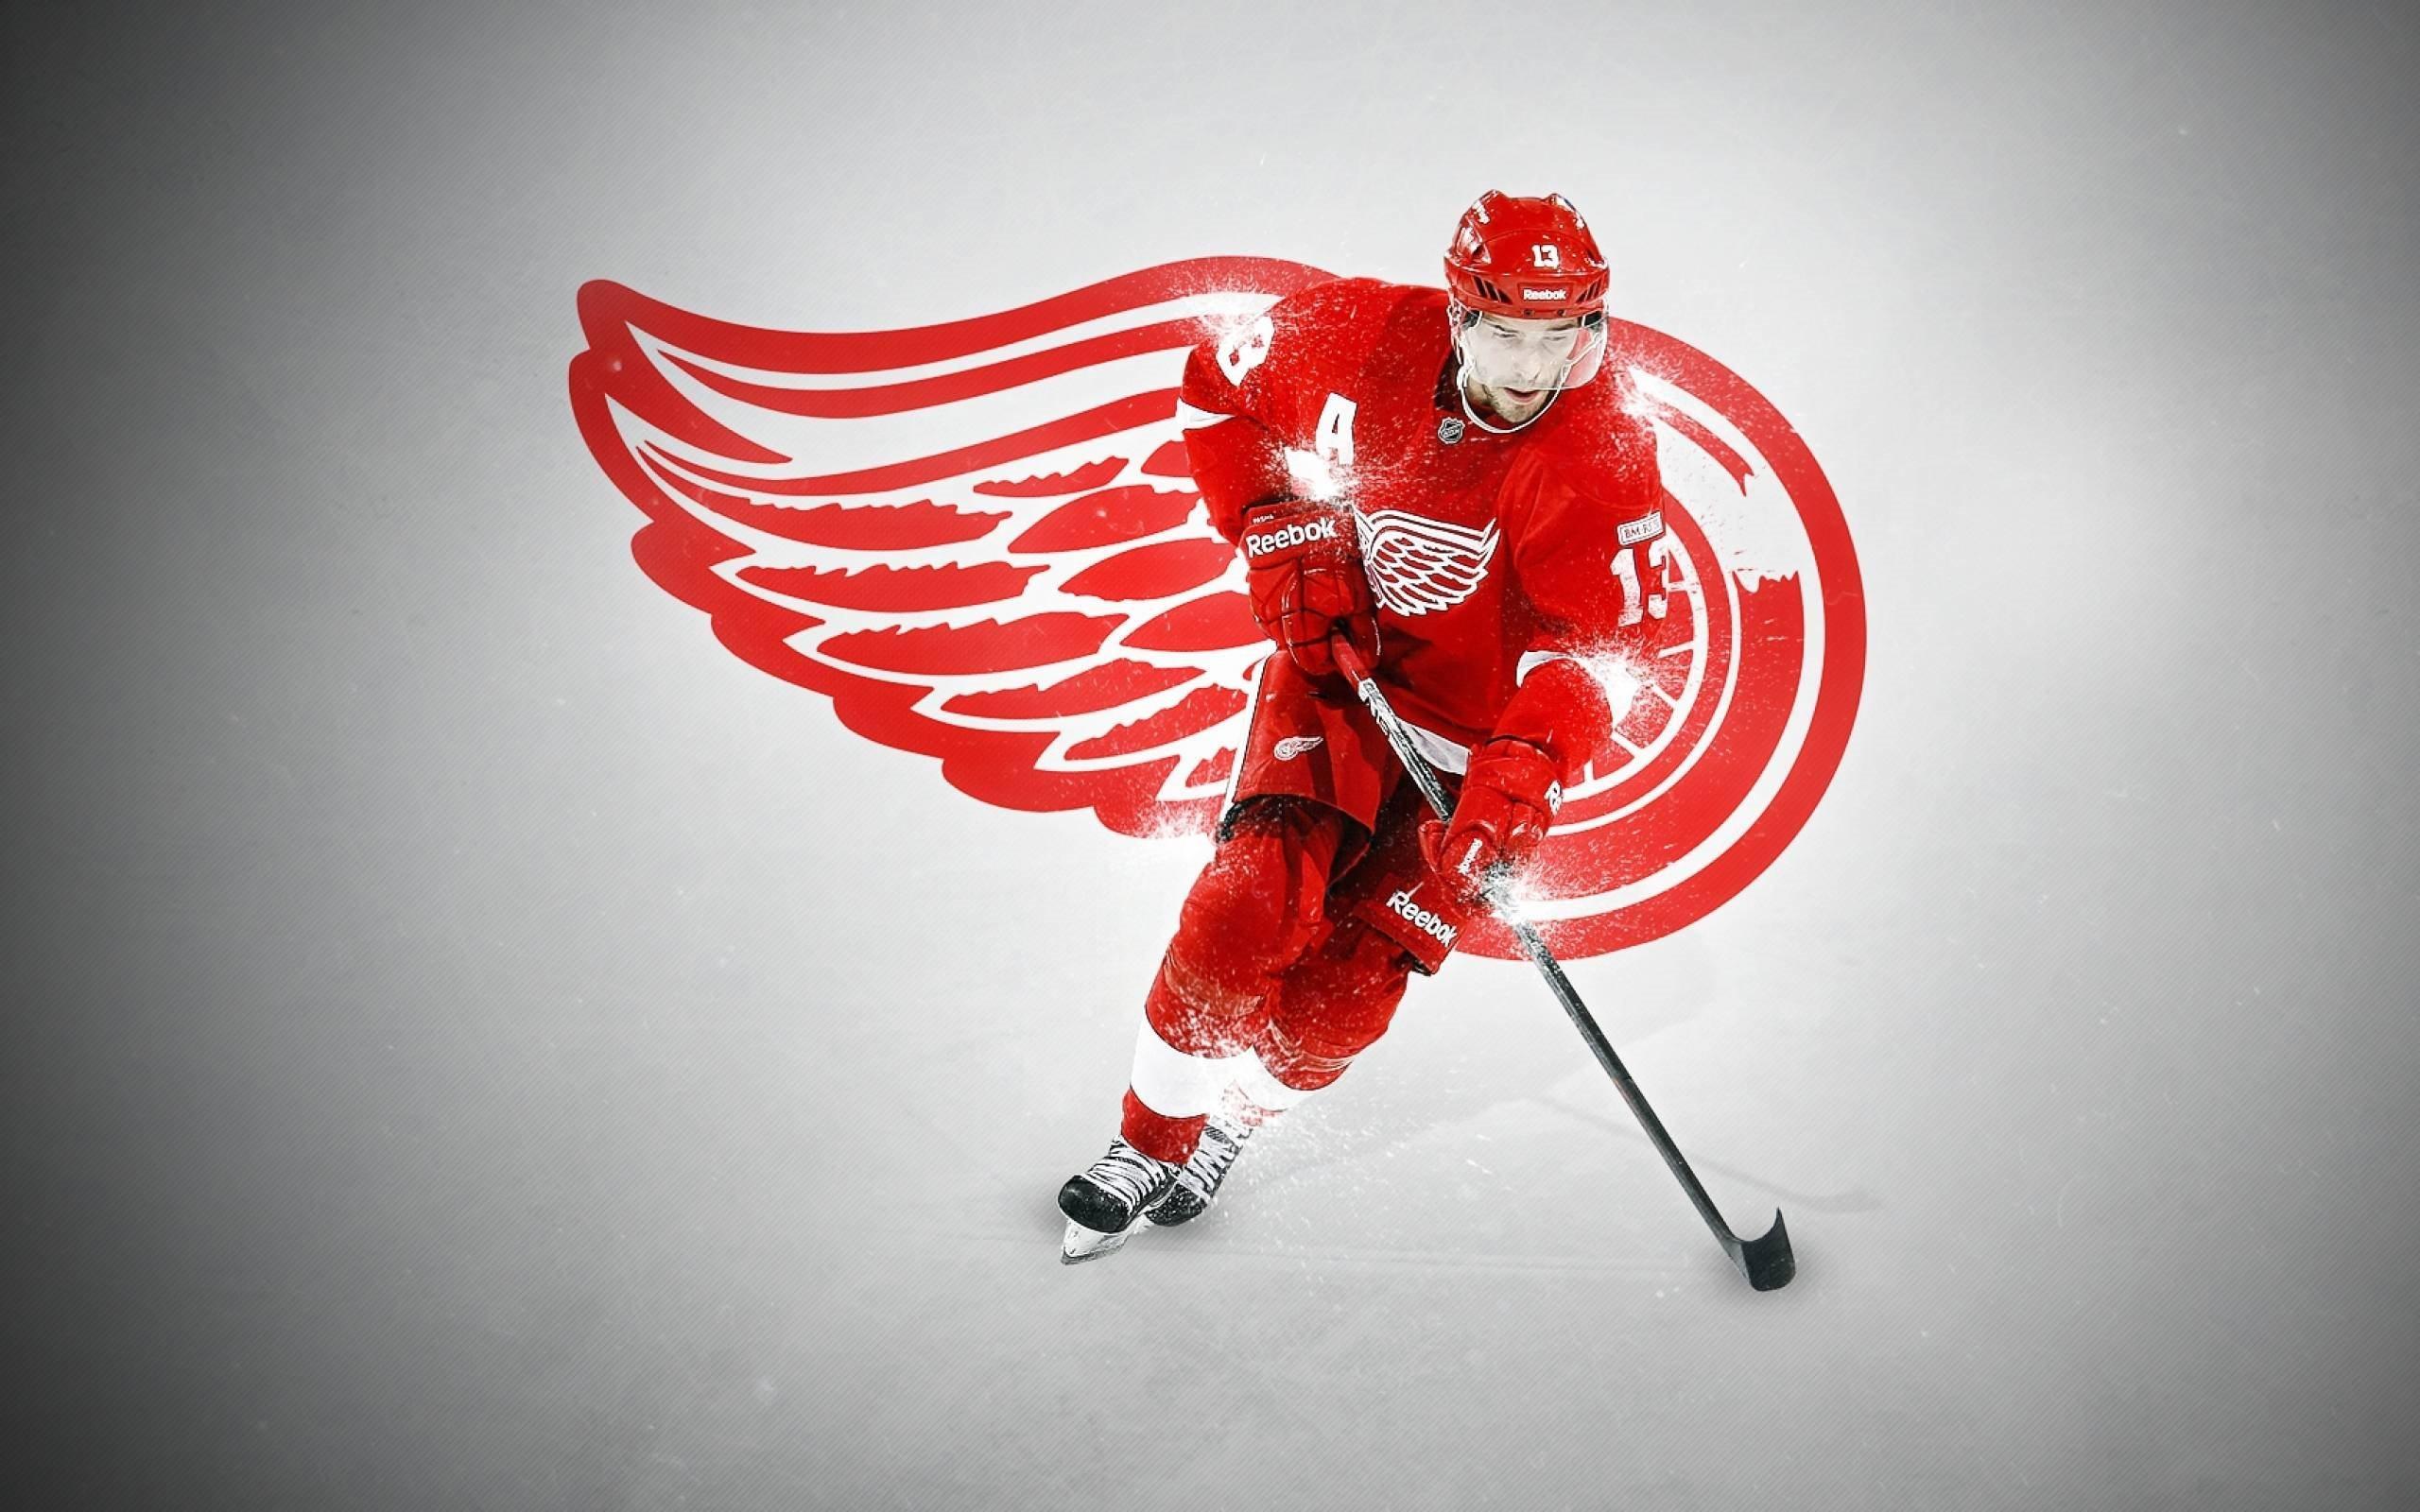 Detroit Red Wings Henrik Zetterberg 3737 Wallpapers and 2560x1600